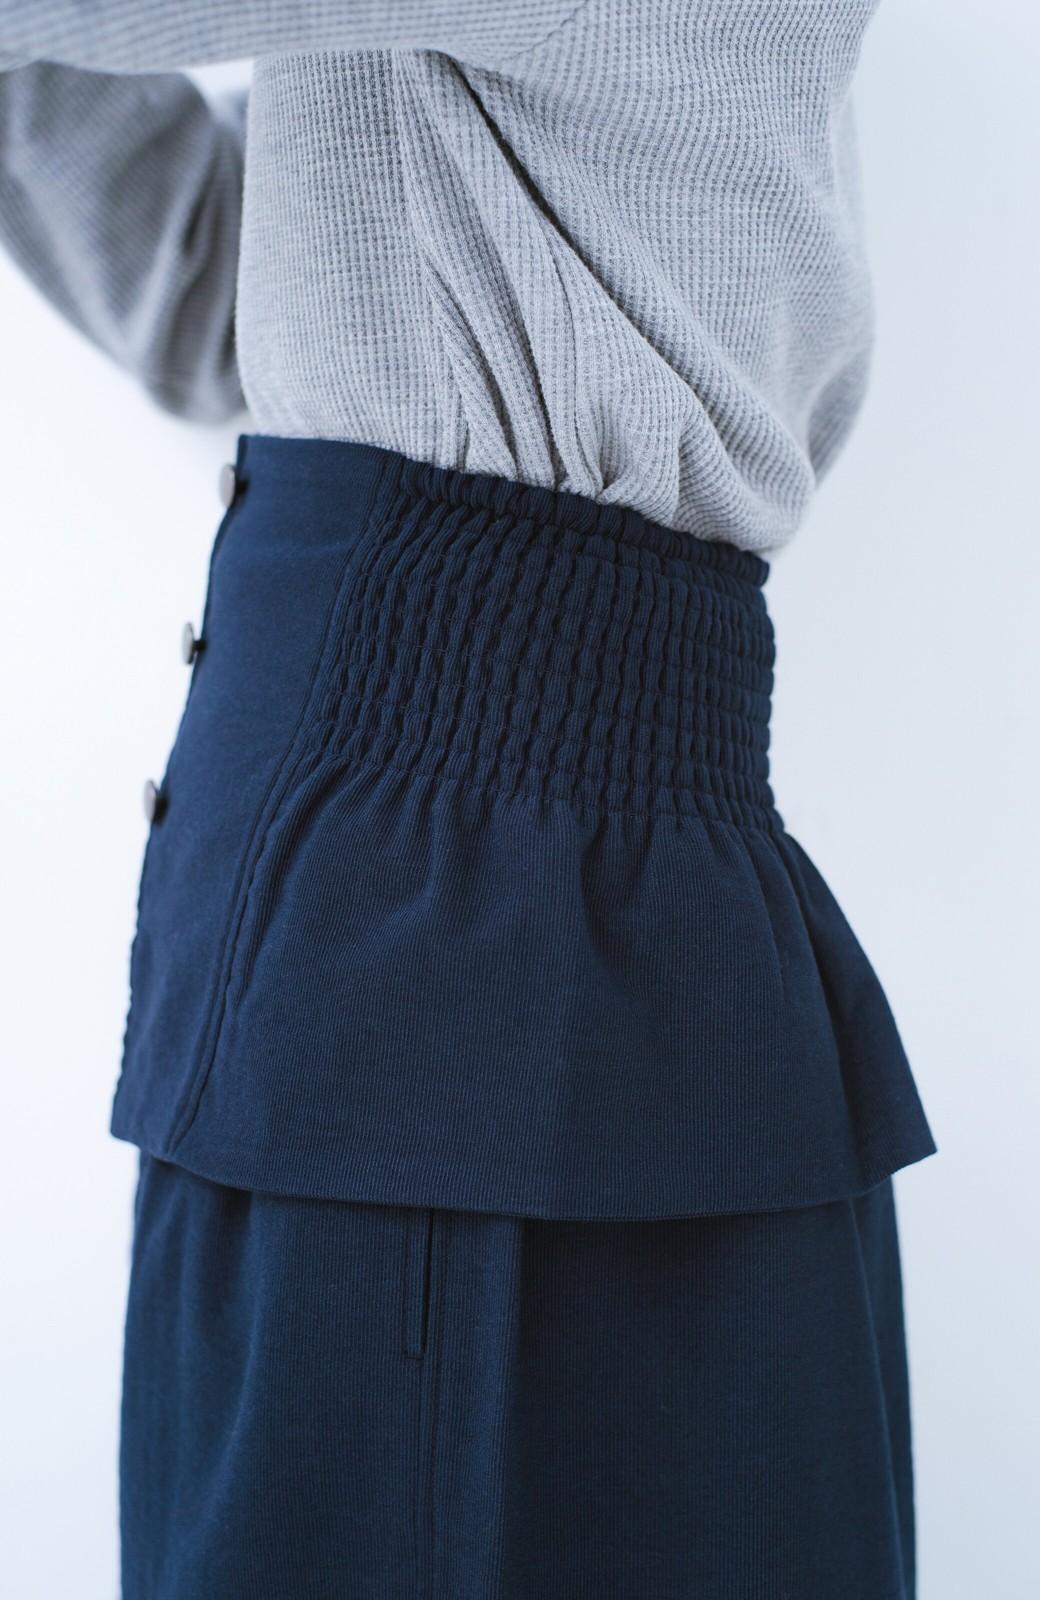 haco!  腹巻きとは呼ばせない ブルー期も華やかに過ごせる消臭加工裏地付きフリルデザインスカートセット【ブルー期】女の子バンザイ!プロジェクト <ネイビー>の商品写真8